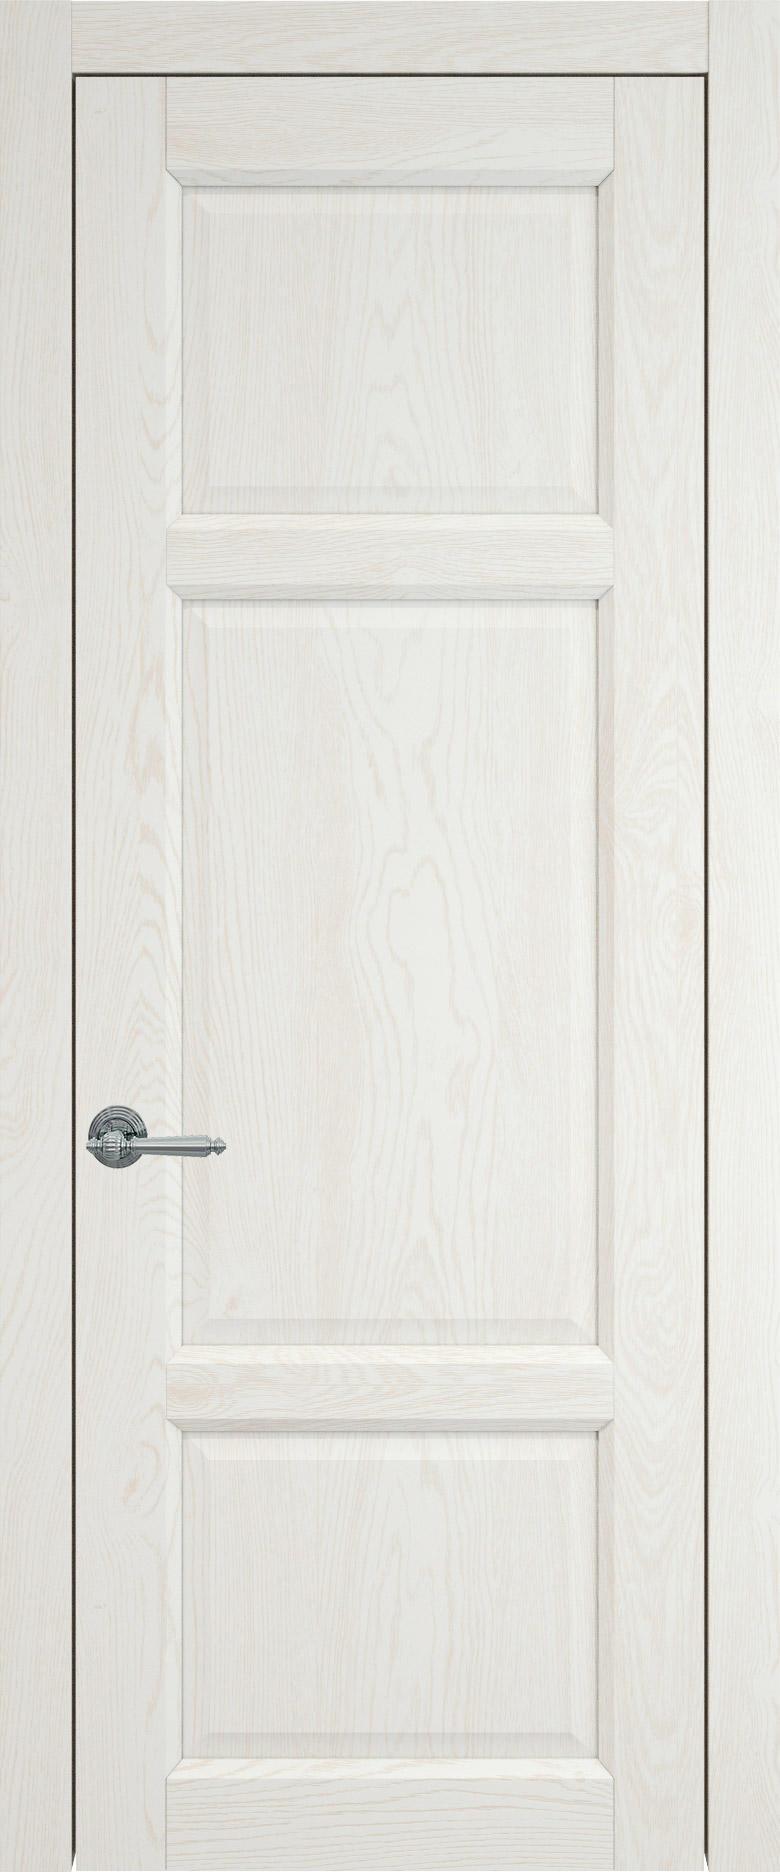 Siena цвет - Белый ясень (nano-flex) Без стекла (ДГ)